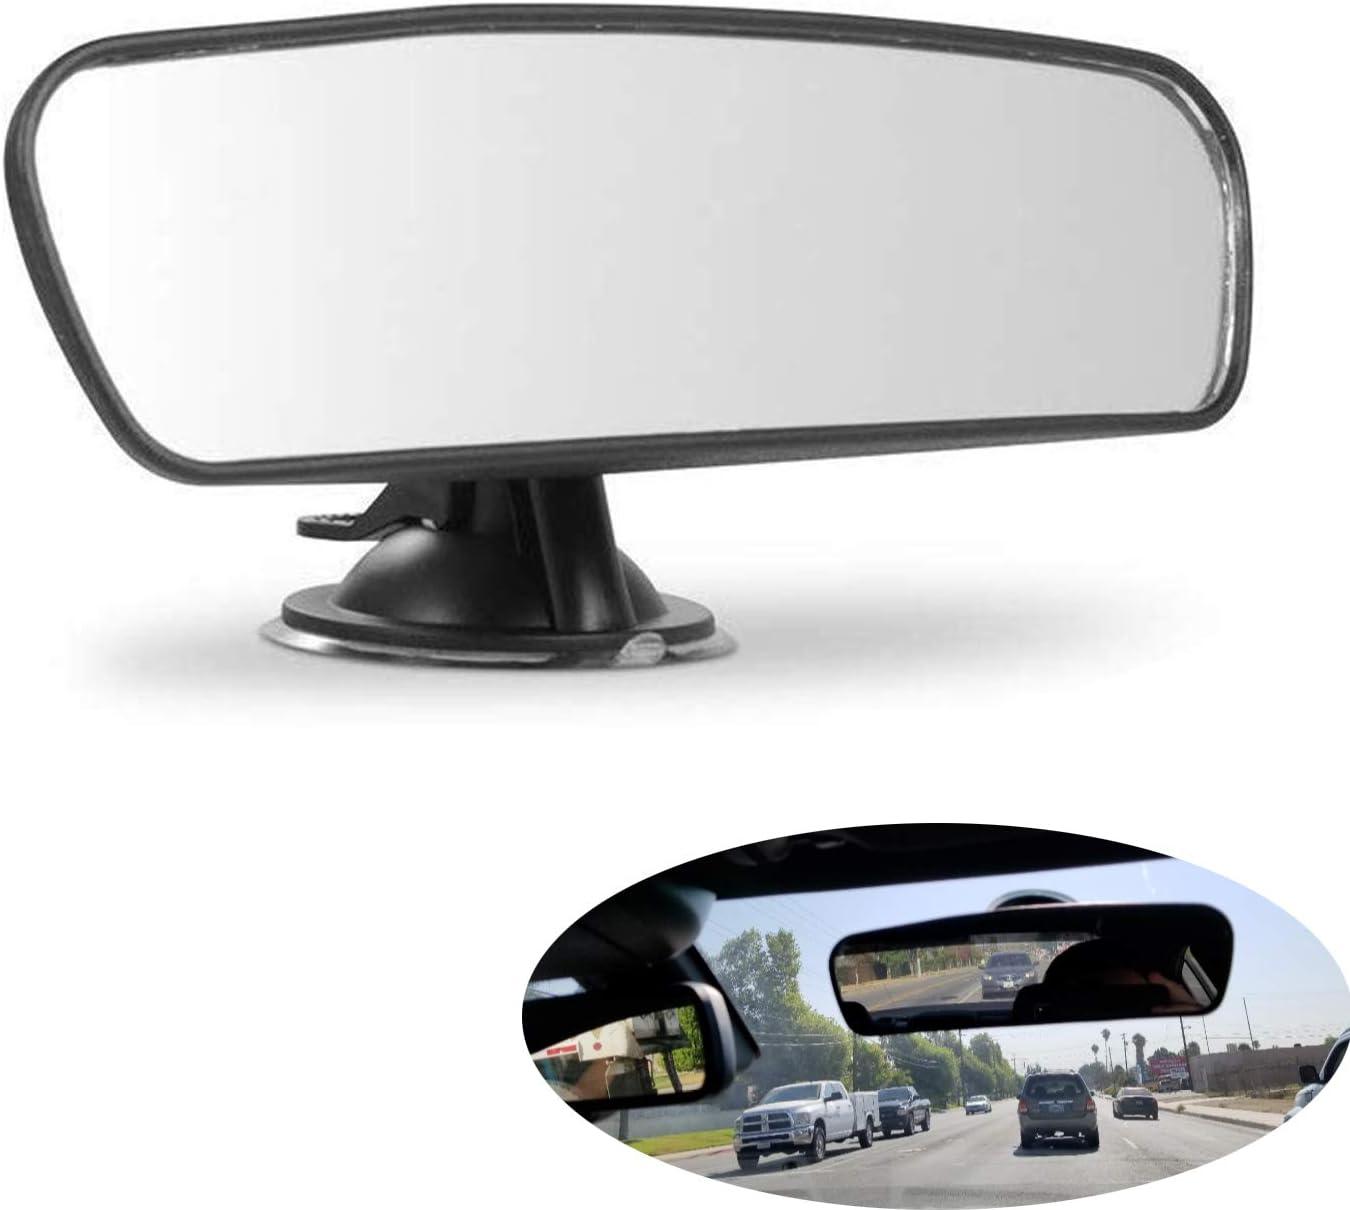 Car Rear View Mirror Universal Auto Truck Interior Mirror (Plain Mirror, Width 21.5cm/8.5in)